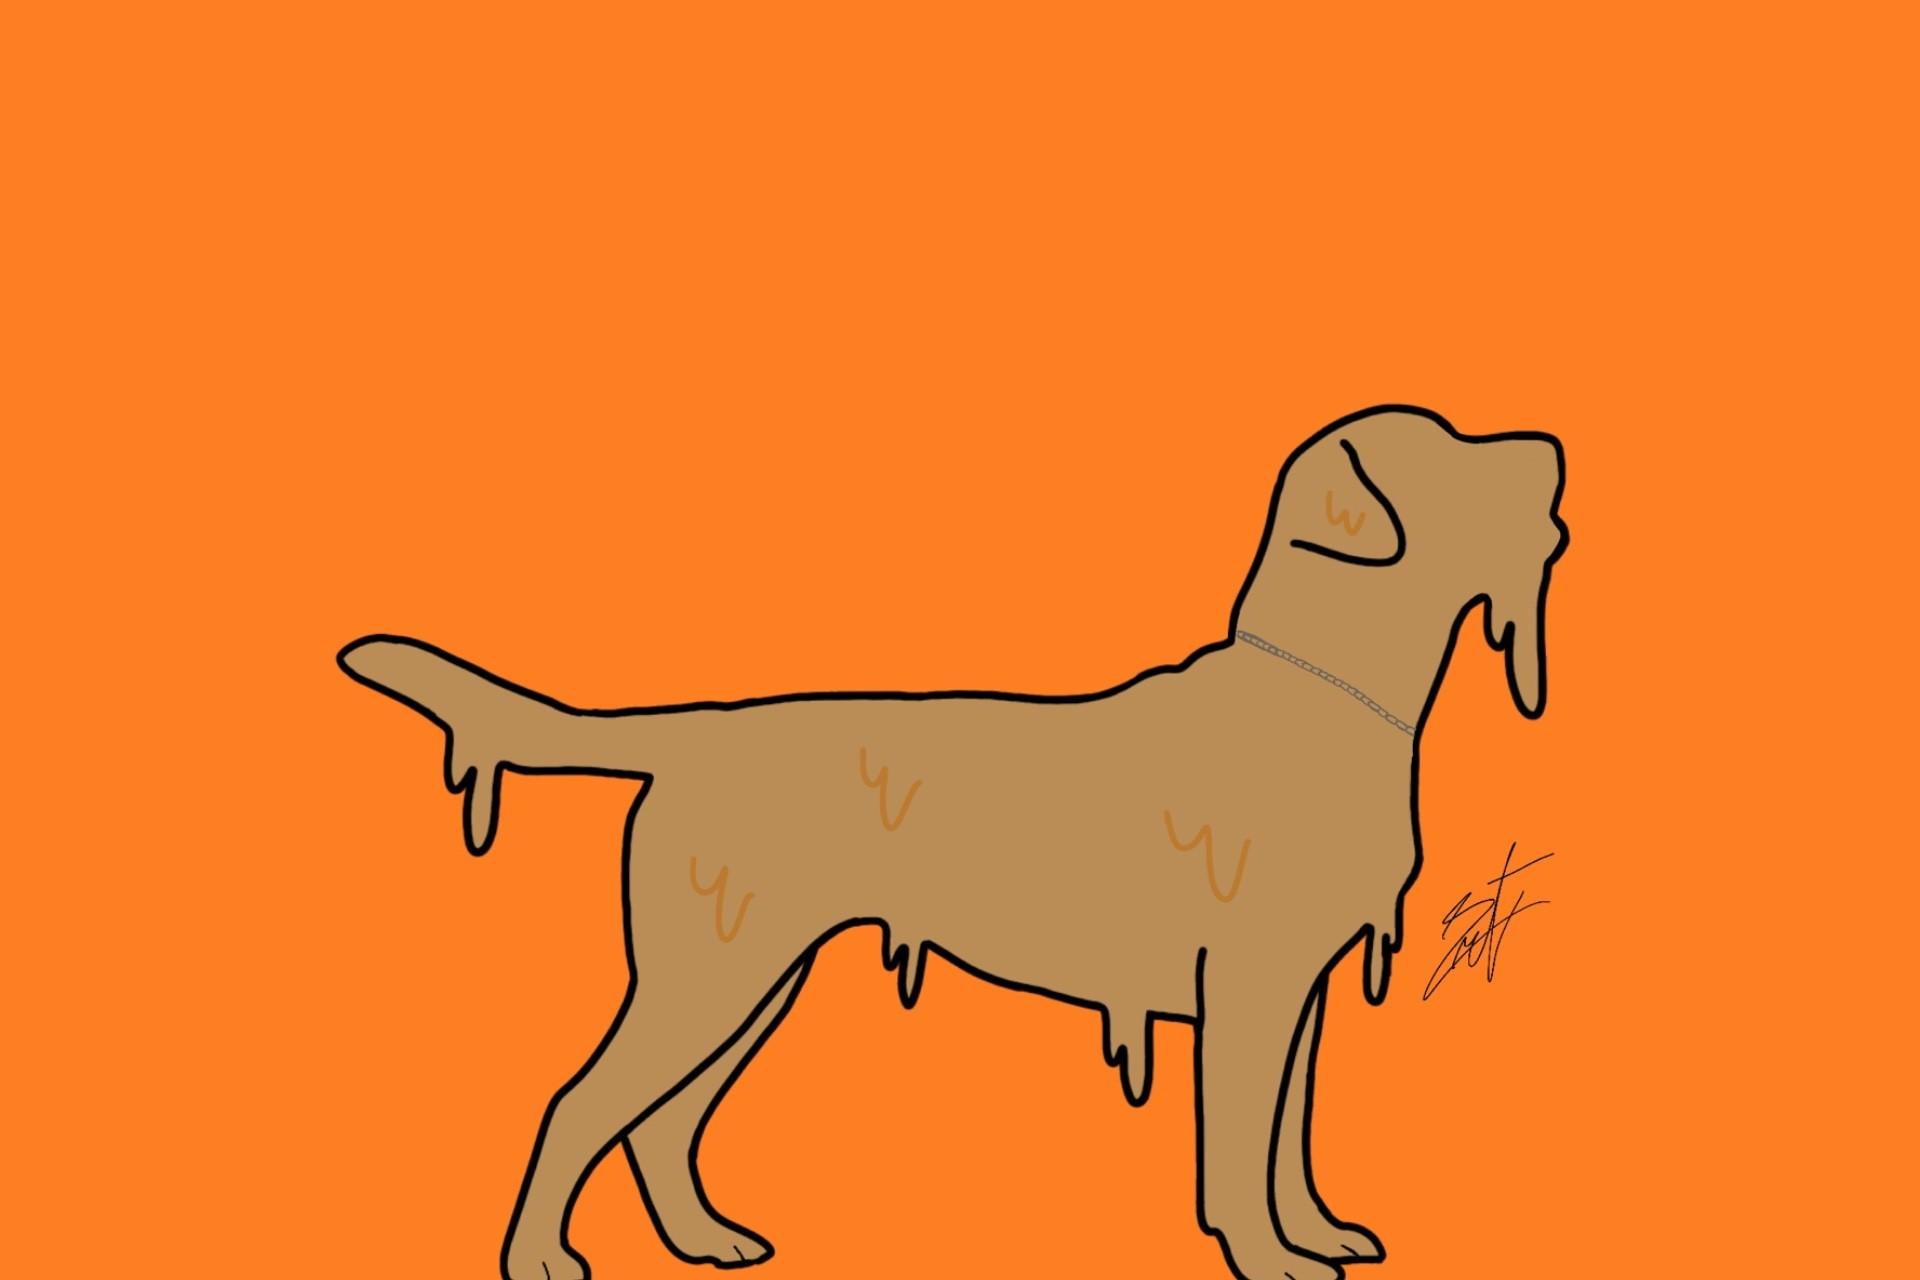 Een dikke hondenvacht beschermt tegen de warmte